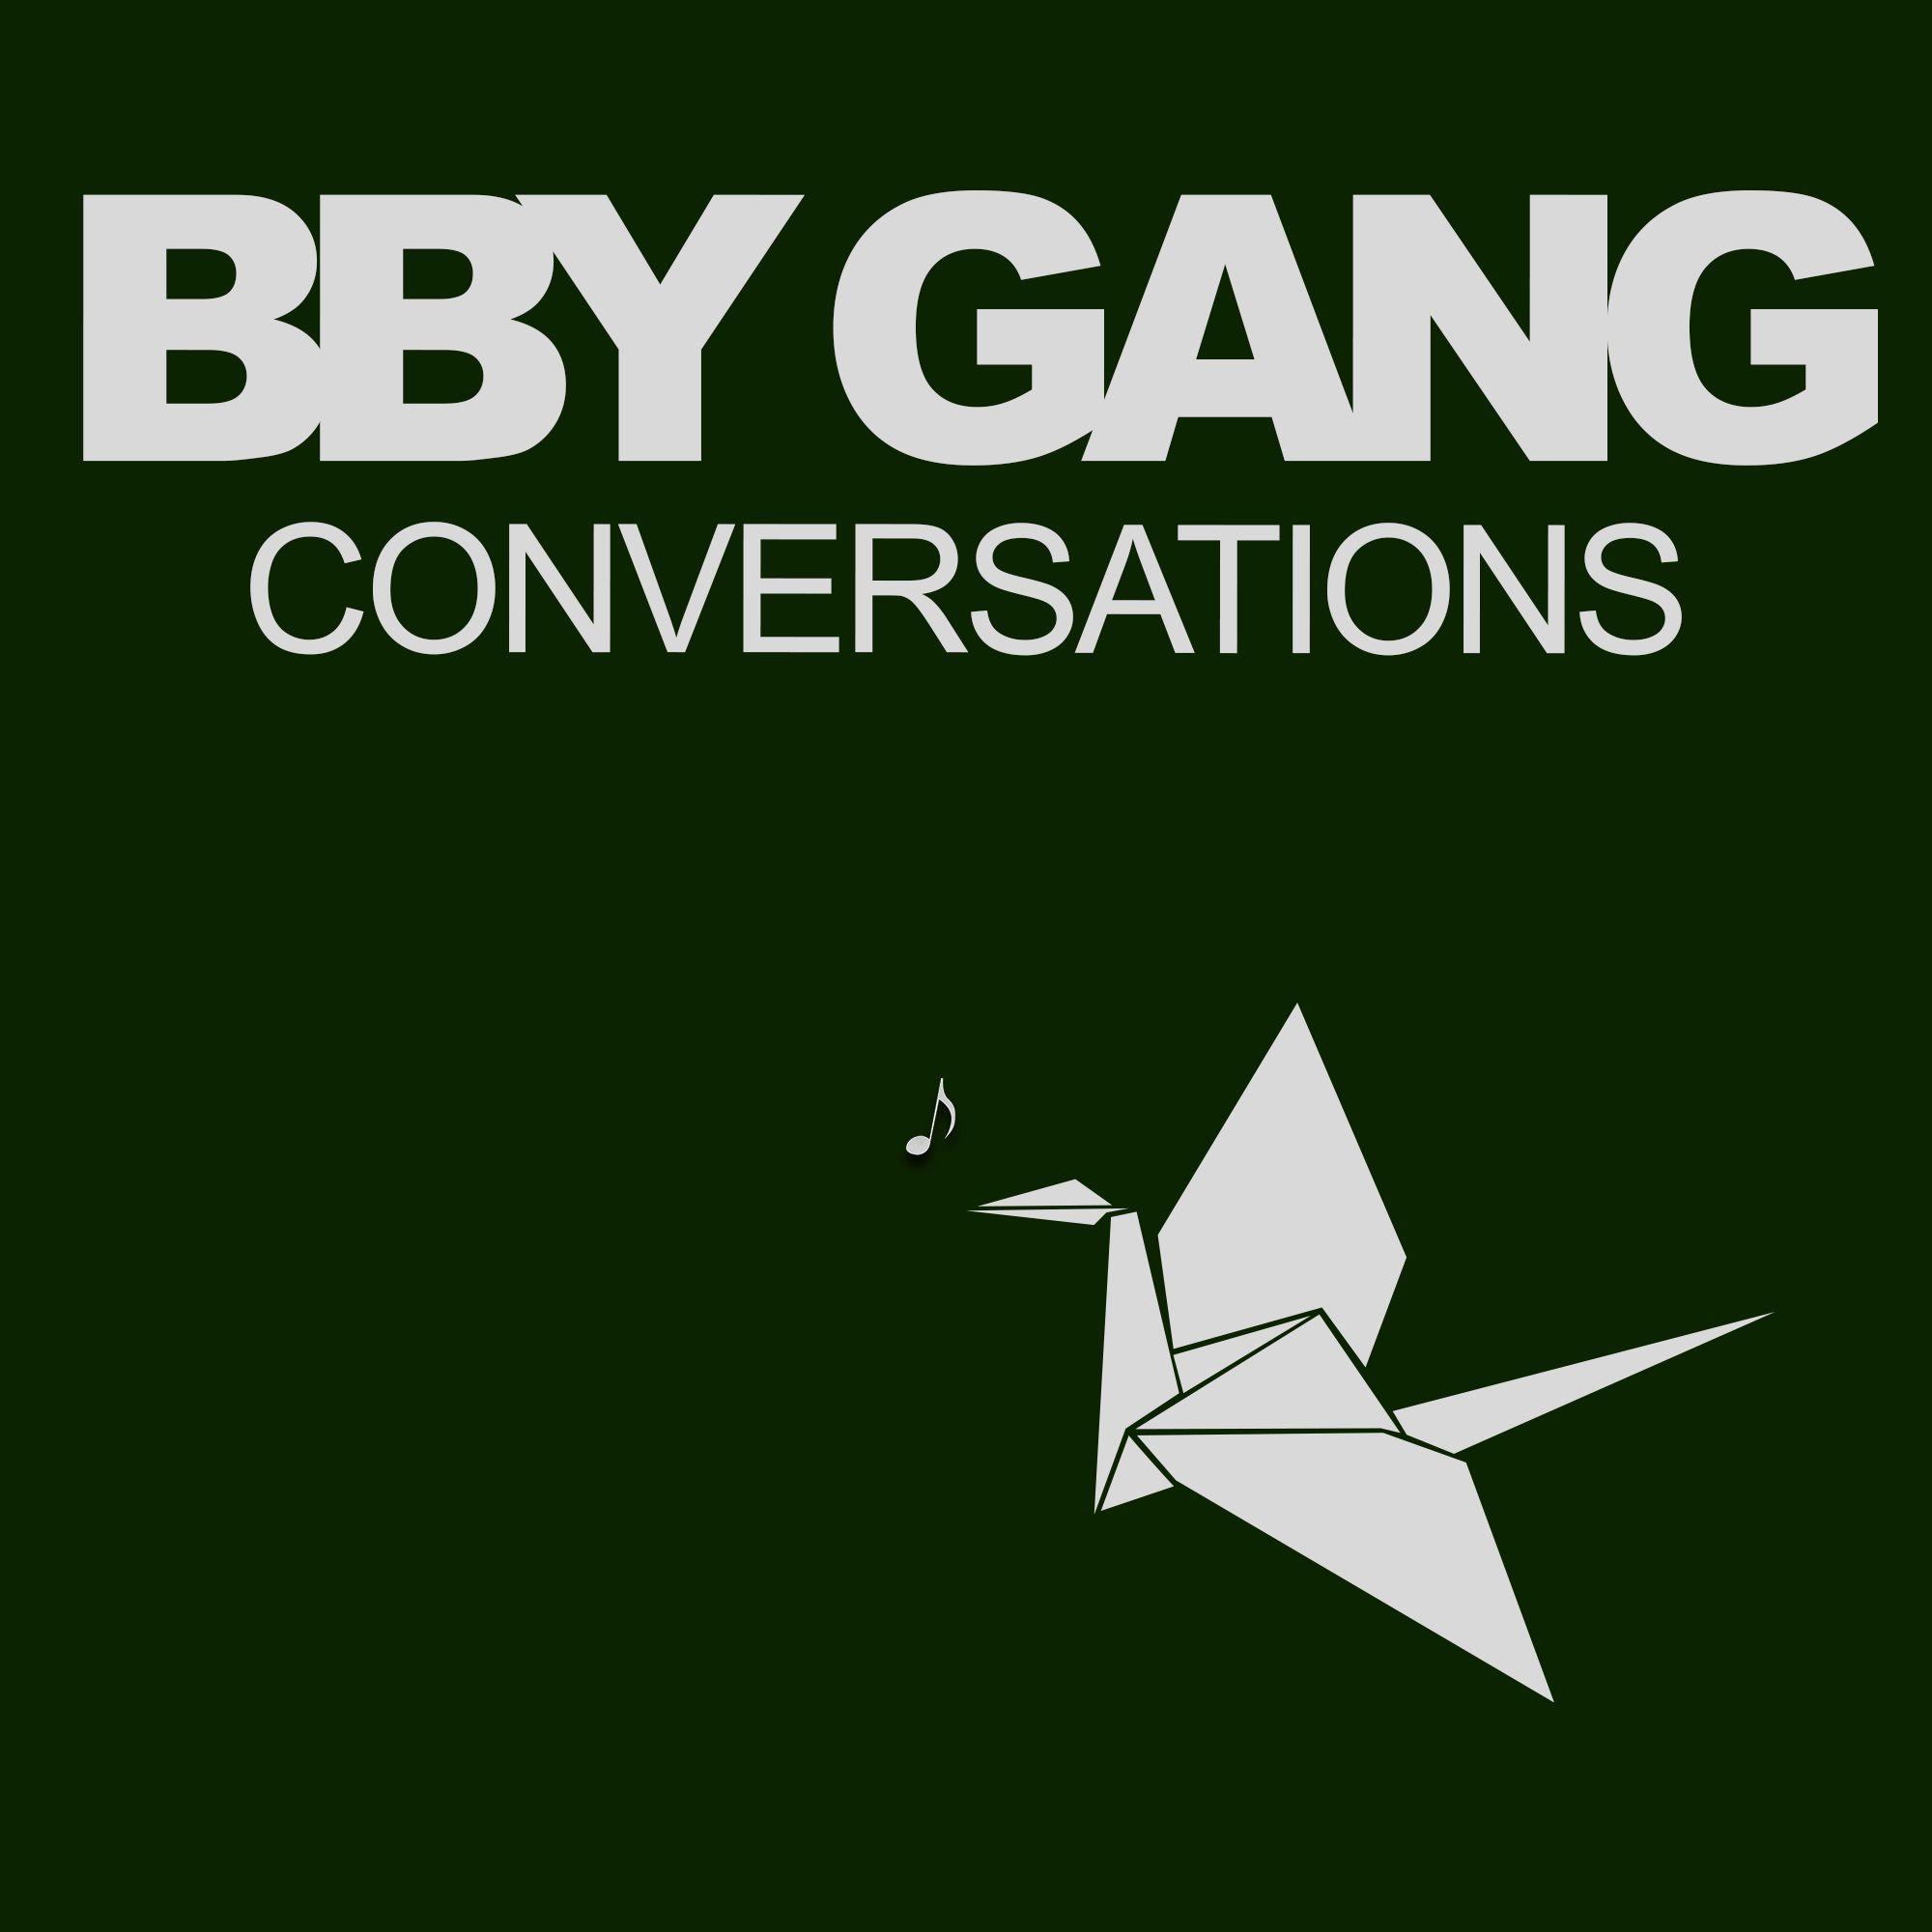 BBY GANG CONVERSATIONS